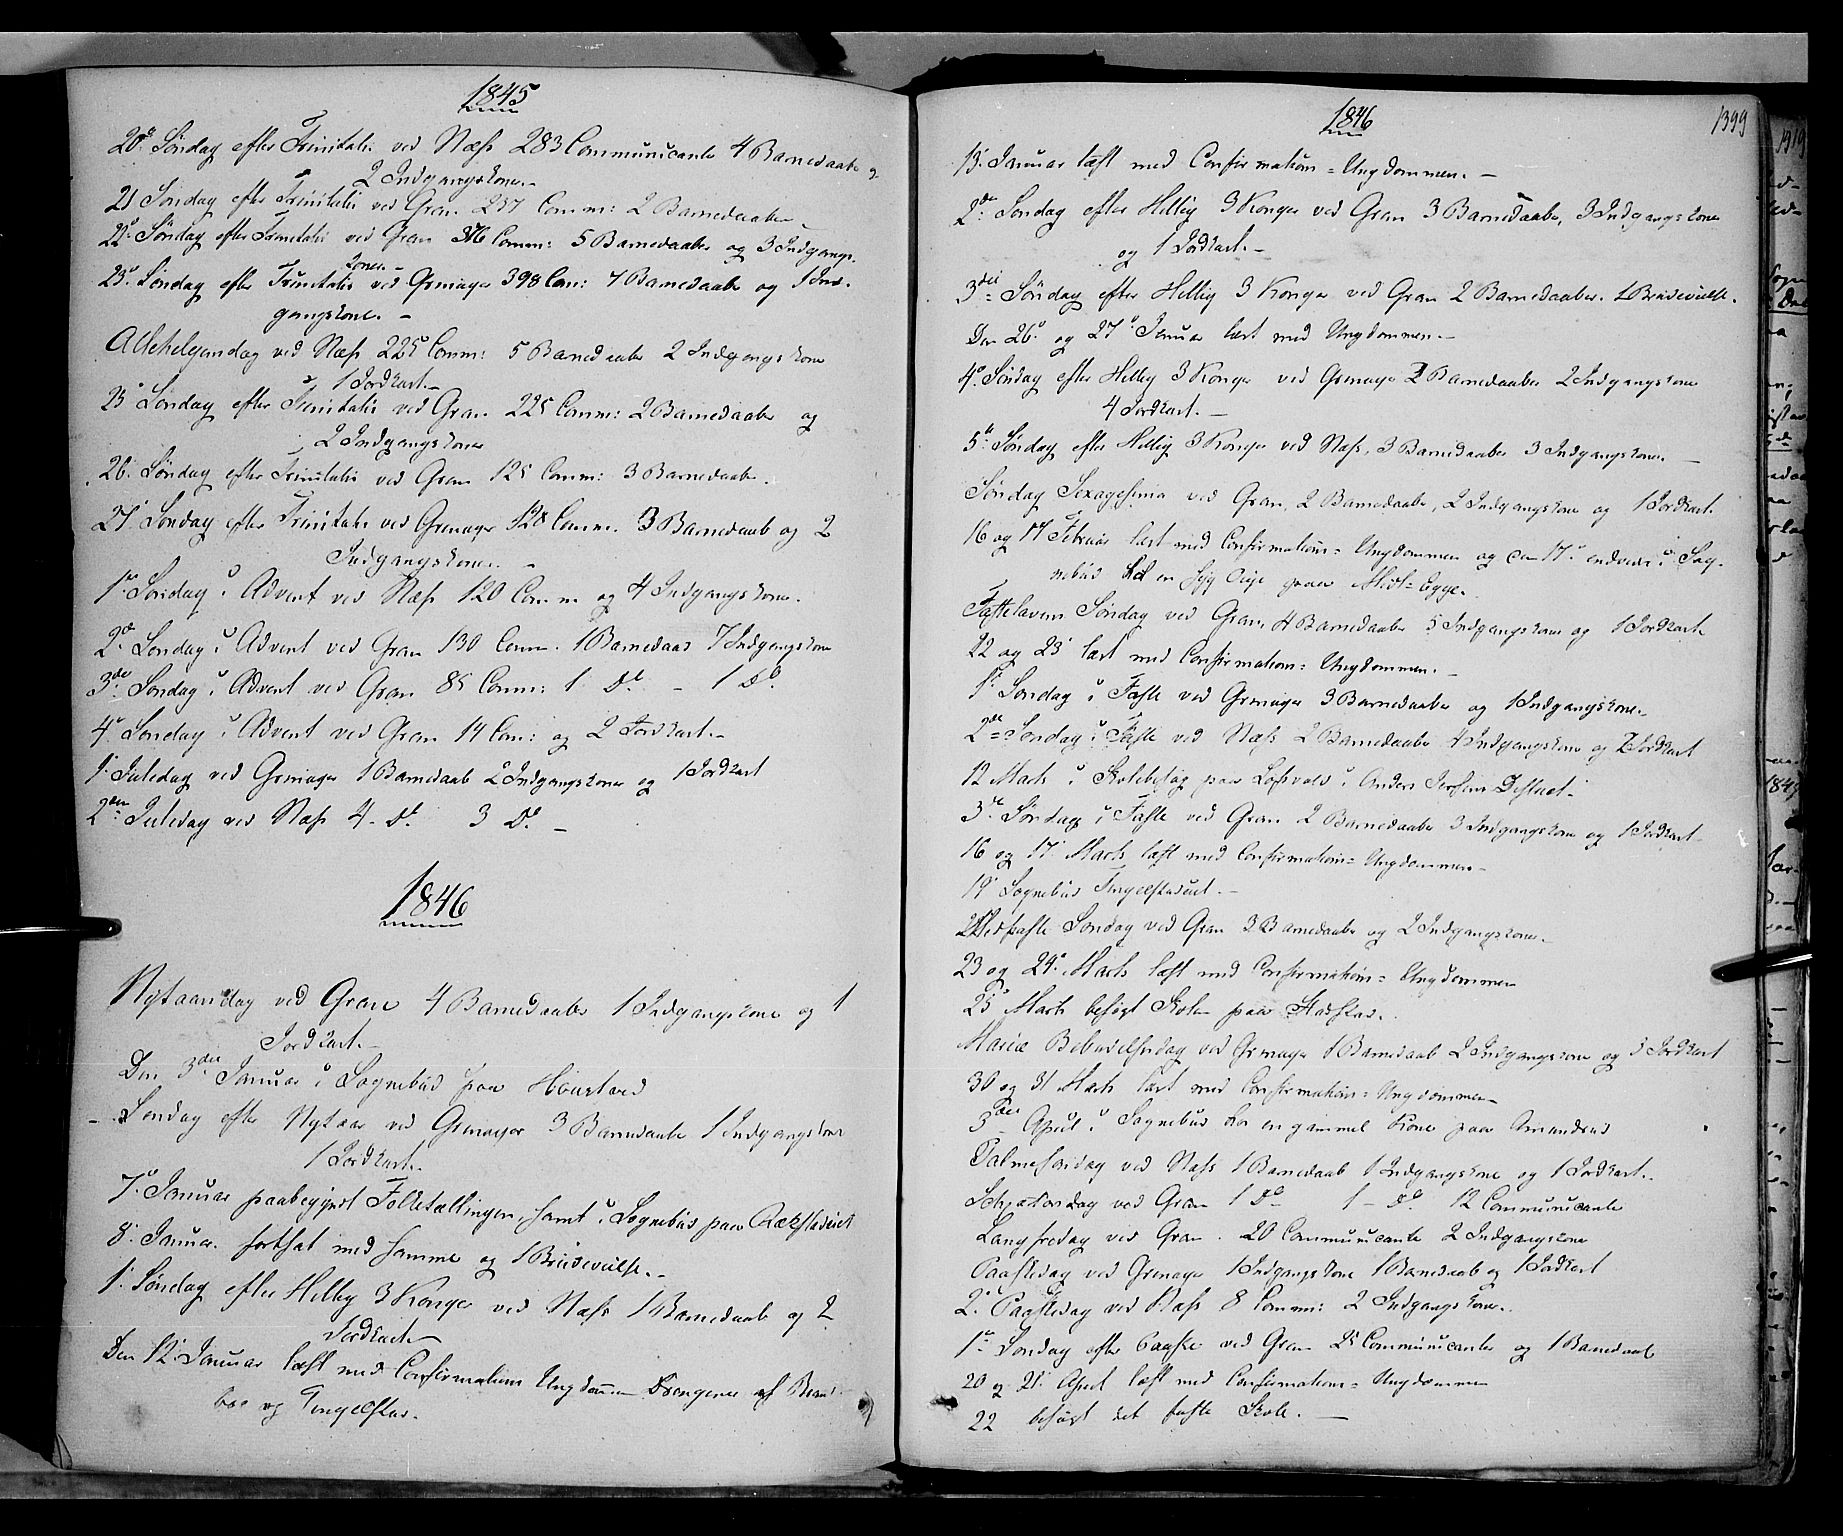 SAH, Gran prestekontor, Ministerialbok nr. 11, 1842-1856, s. 1398-1399